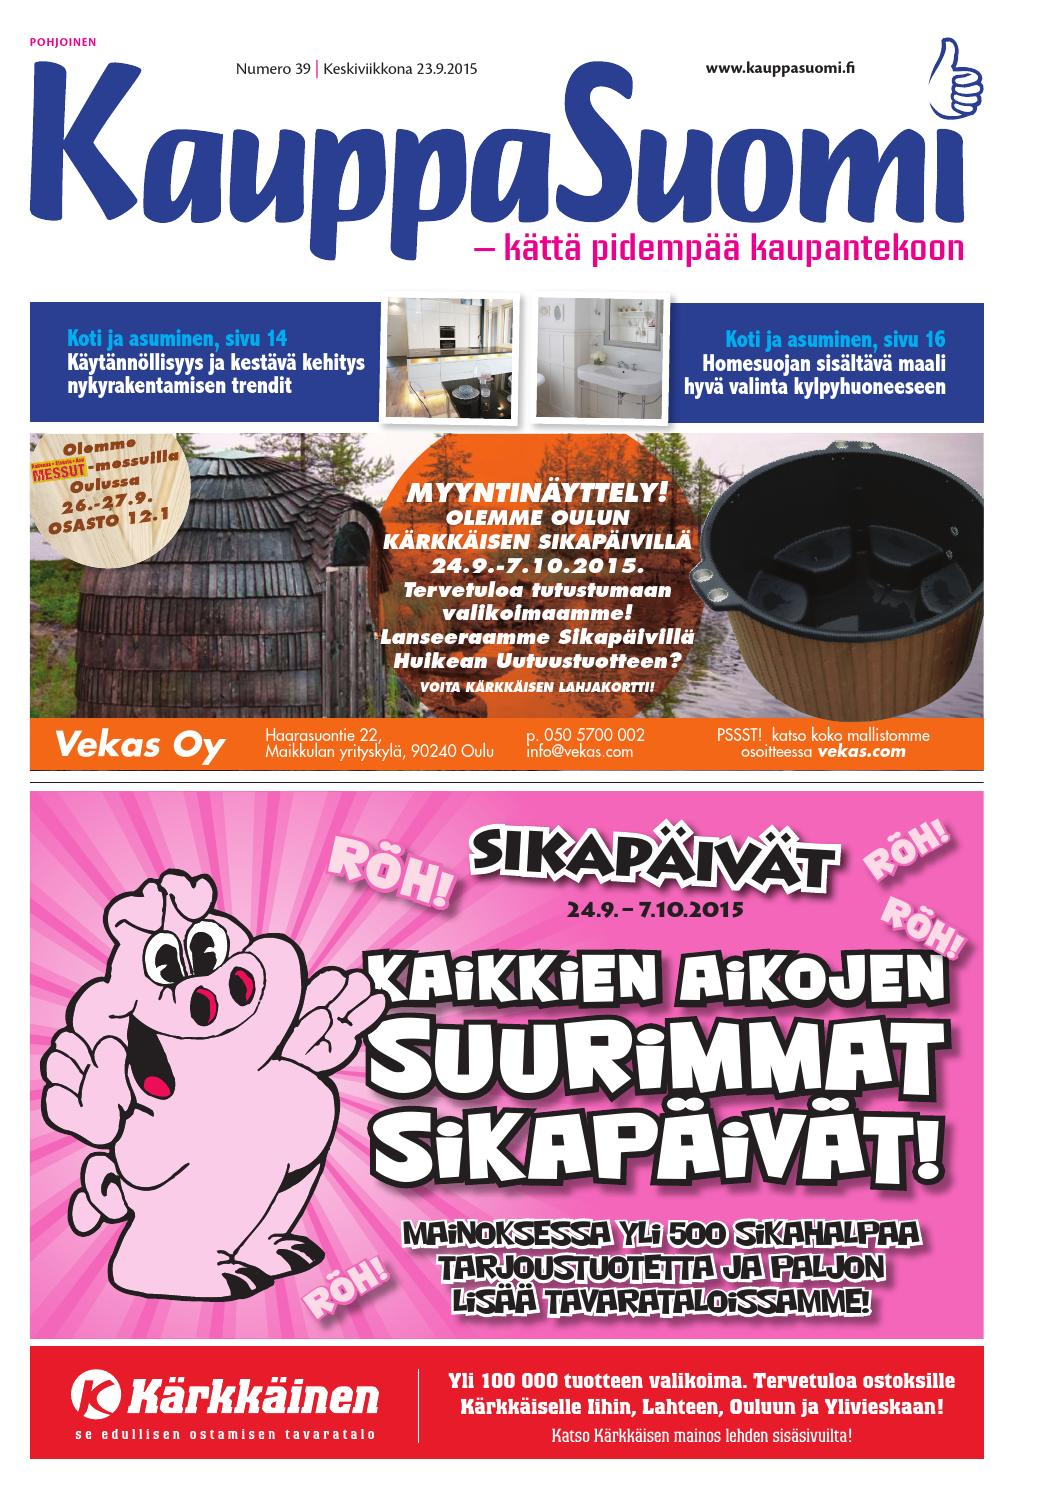 KauppaSuomi by KauppaSuomi - issuu 88ad03d038